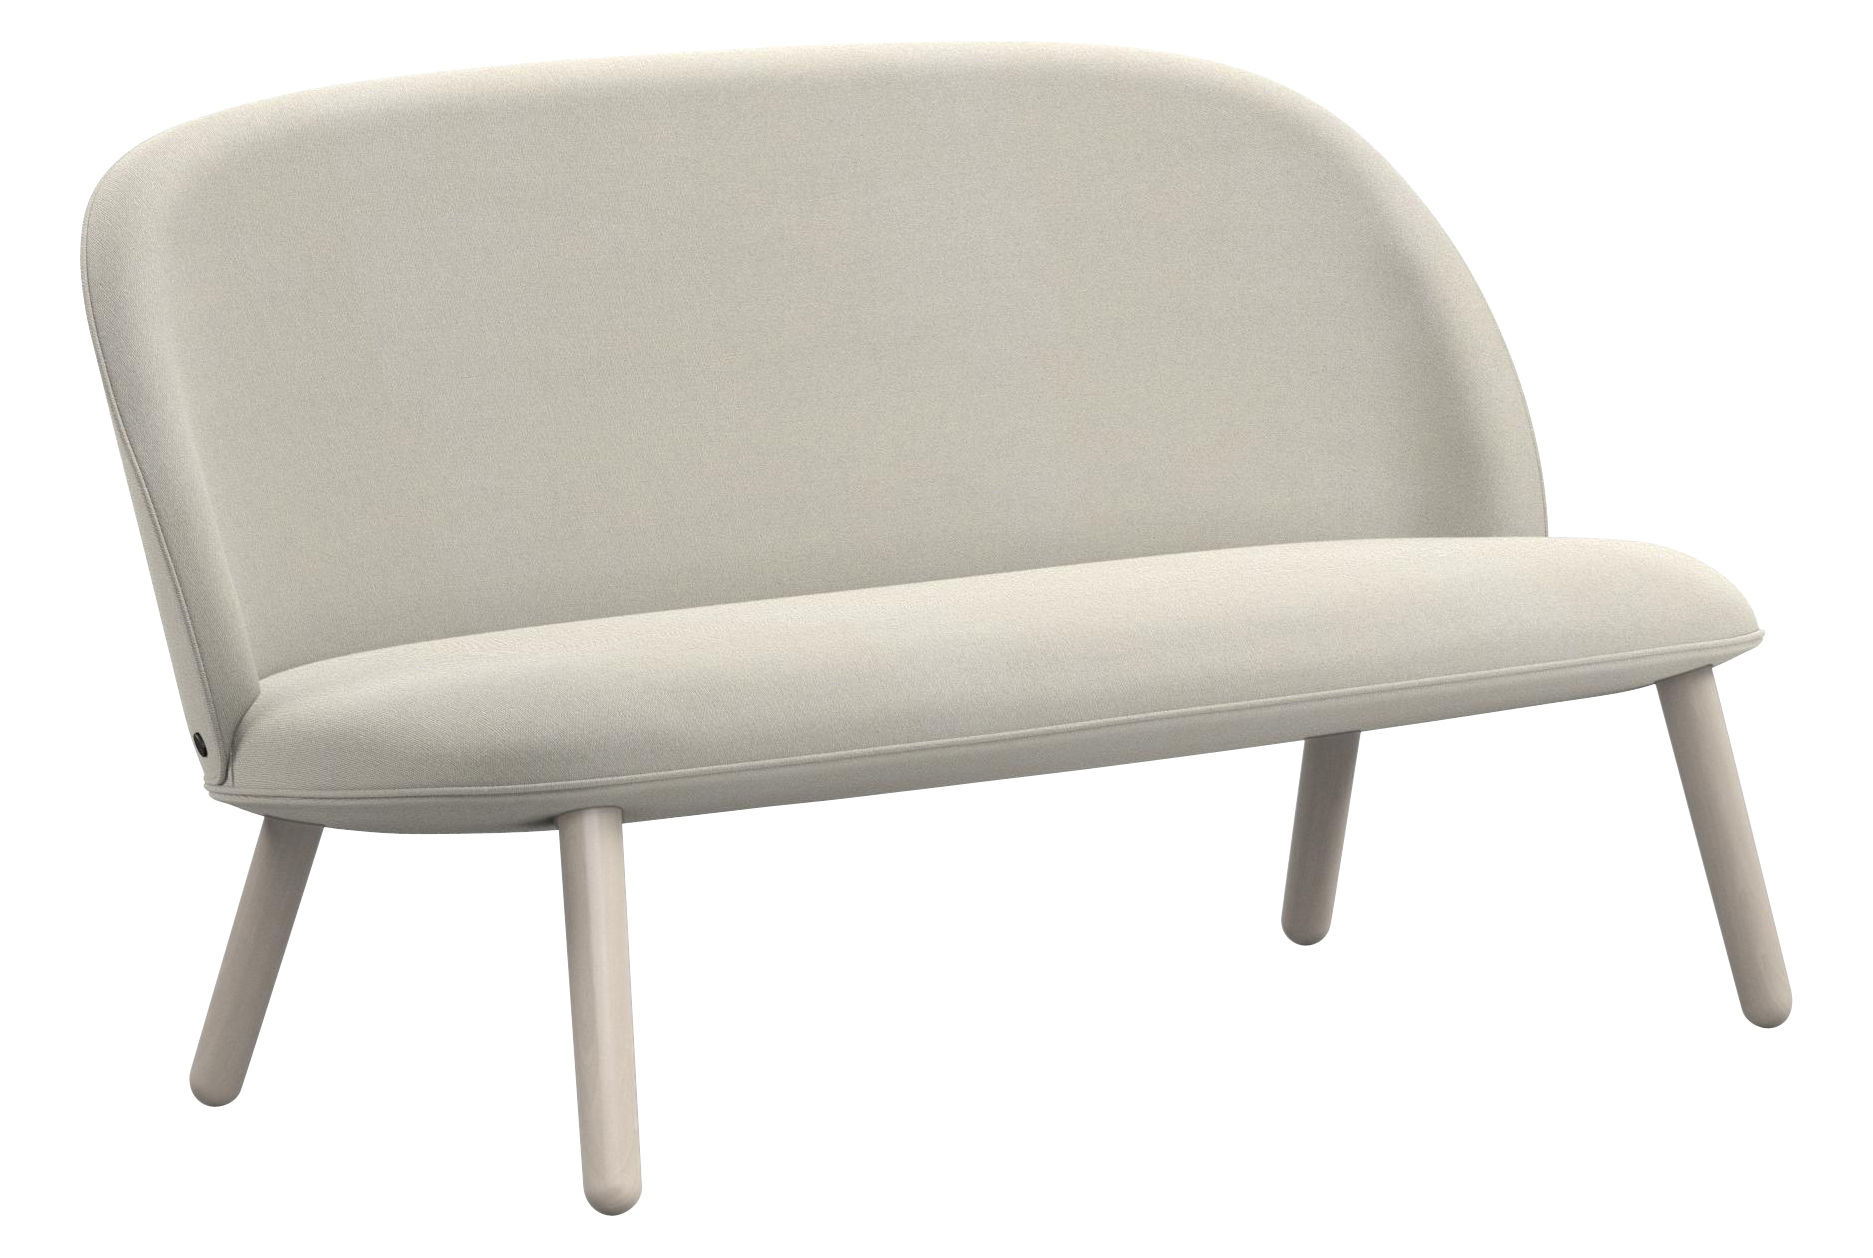 Ace divano destro 2 posti l 145 cm tessuto tessuto for Divano 2 posti 140 cm